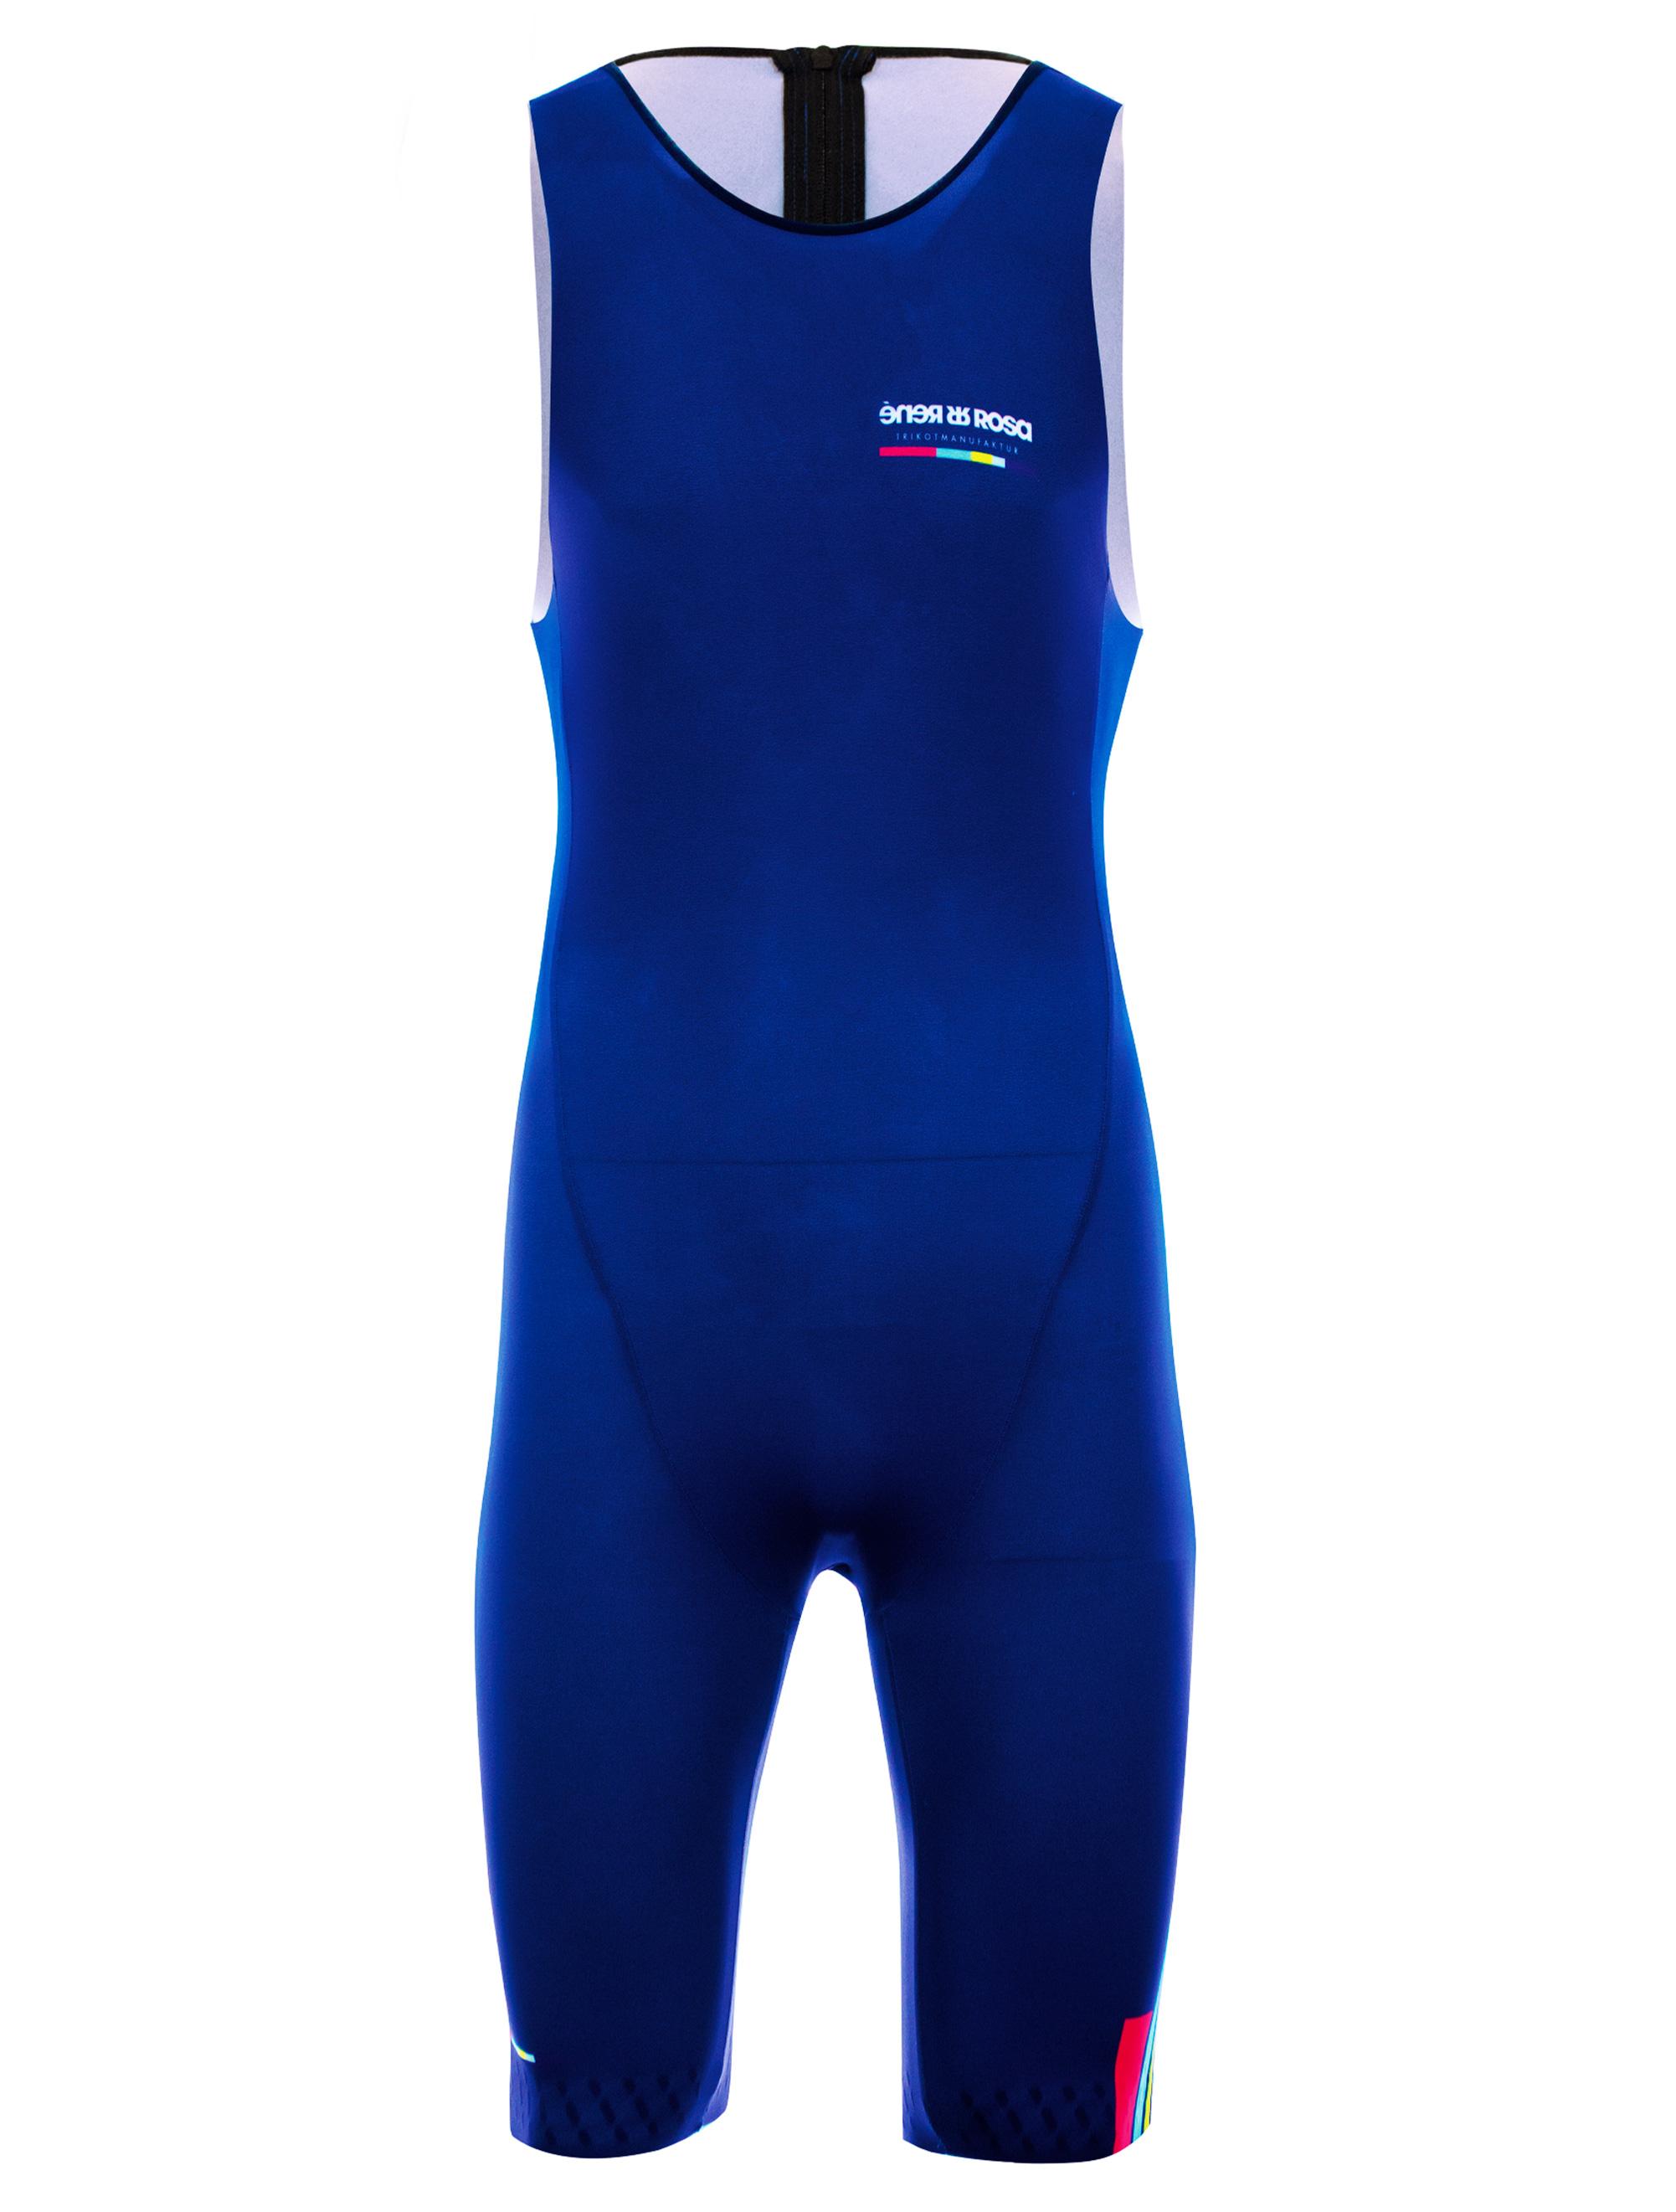 Aero Triathlon Kurzdistanzeinteiler  RRT2780M / RR-Stripes Blau